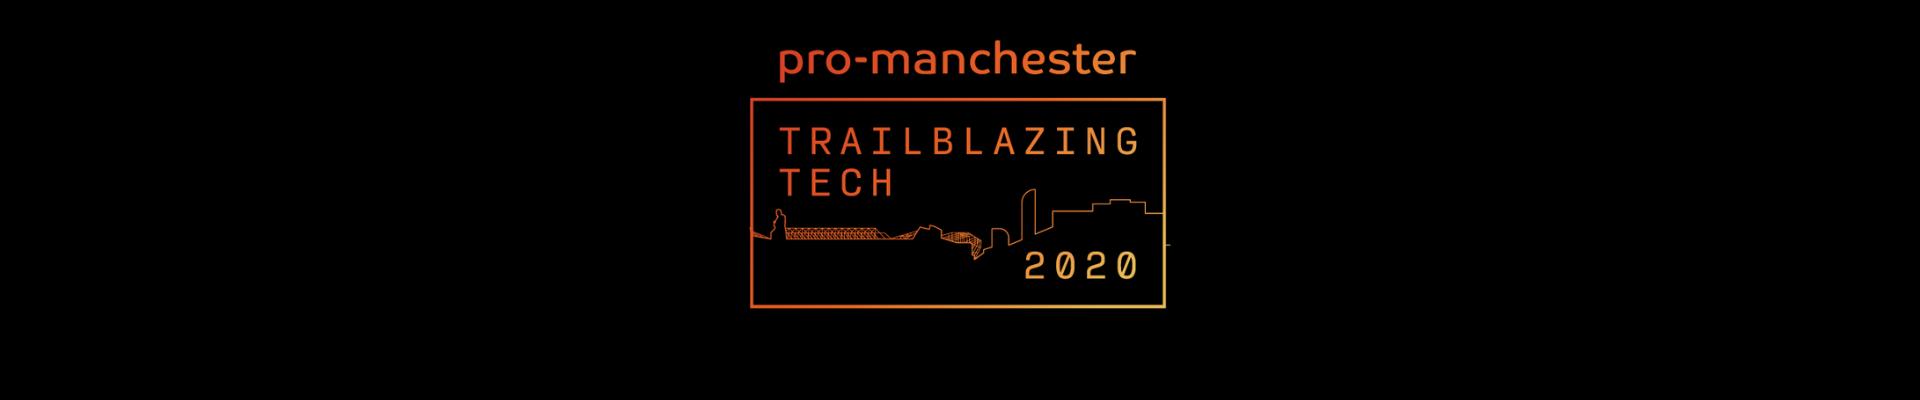 Trailblazing Technology Conference 2020